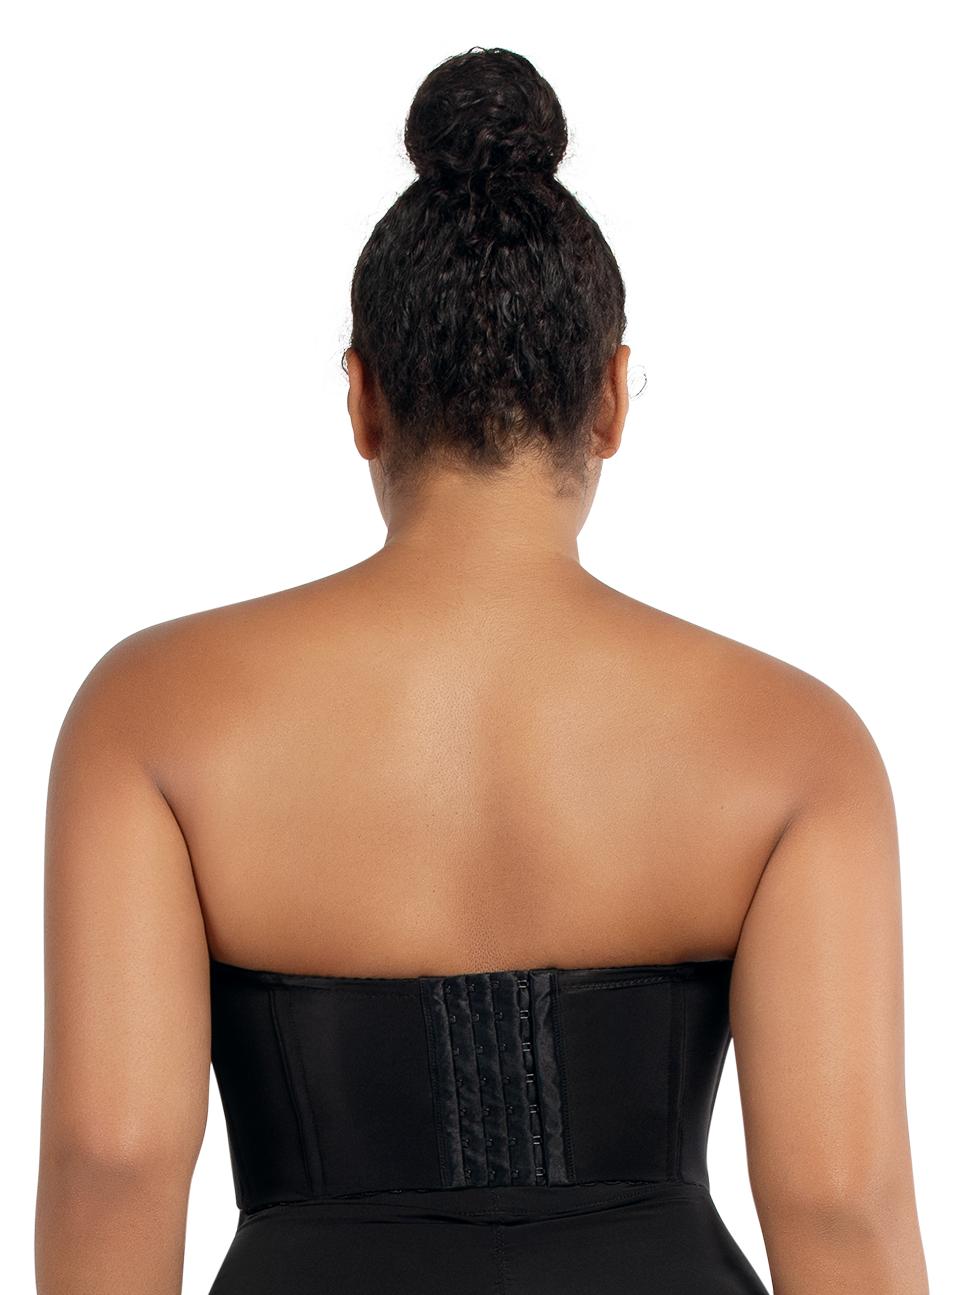 PARFAIT Elissa StraplessContourBustierP50116 Black Back - Elissa Short Bustier Black P50116